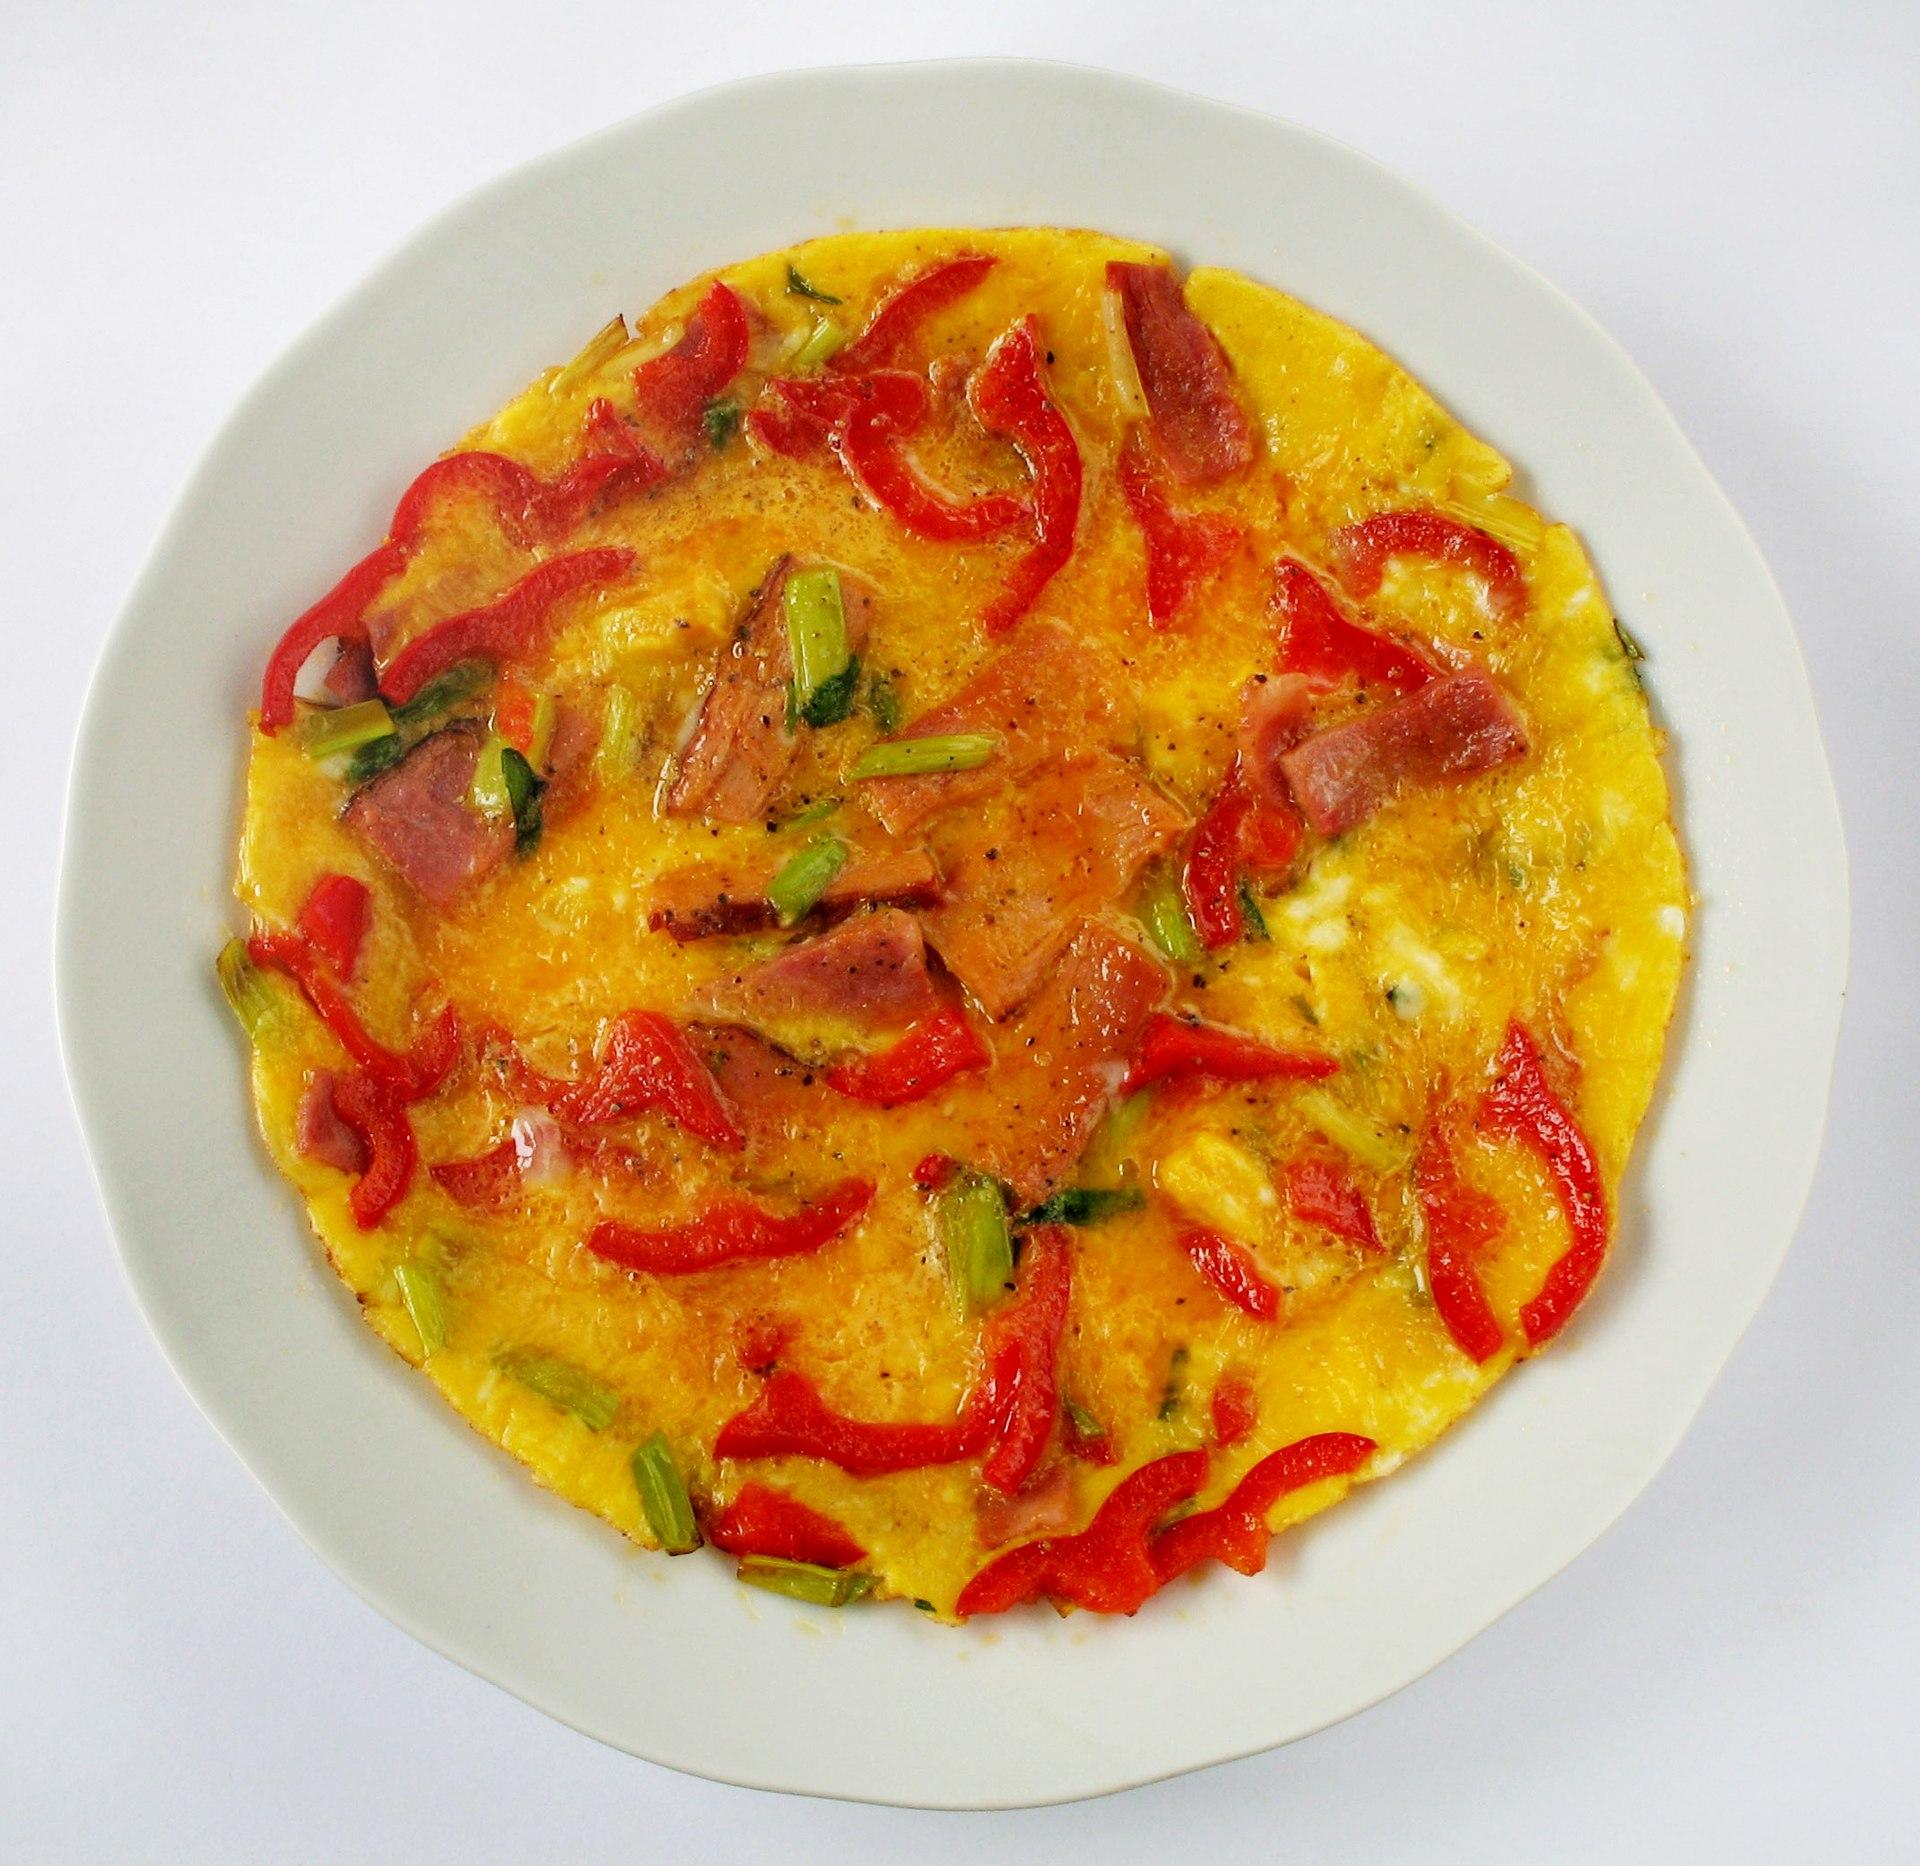 how to make a 4 egg omelette